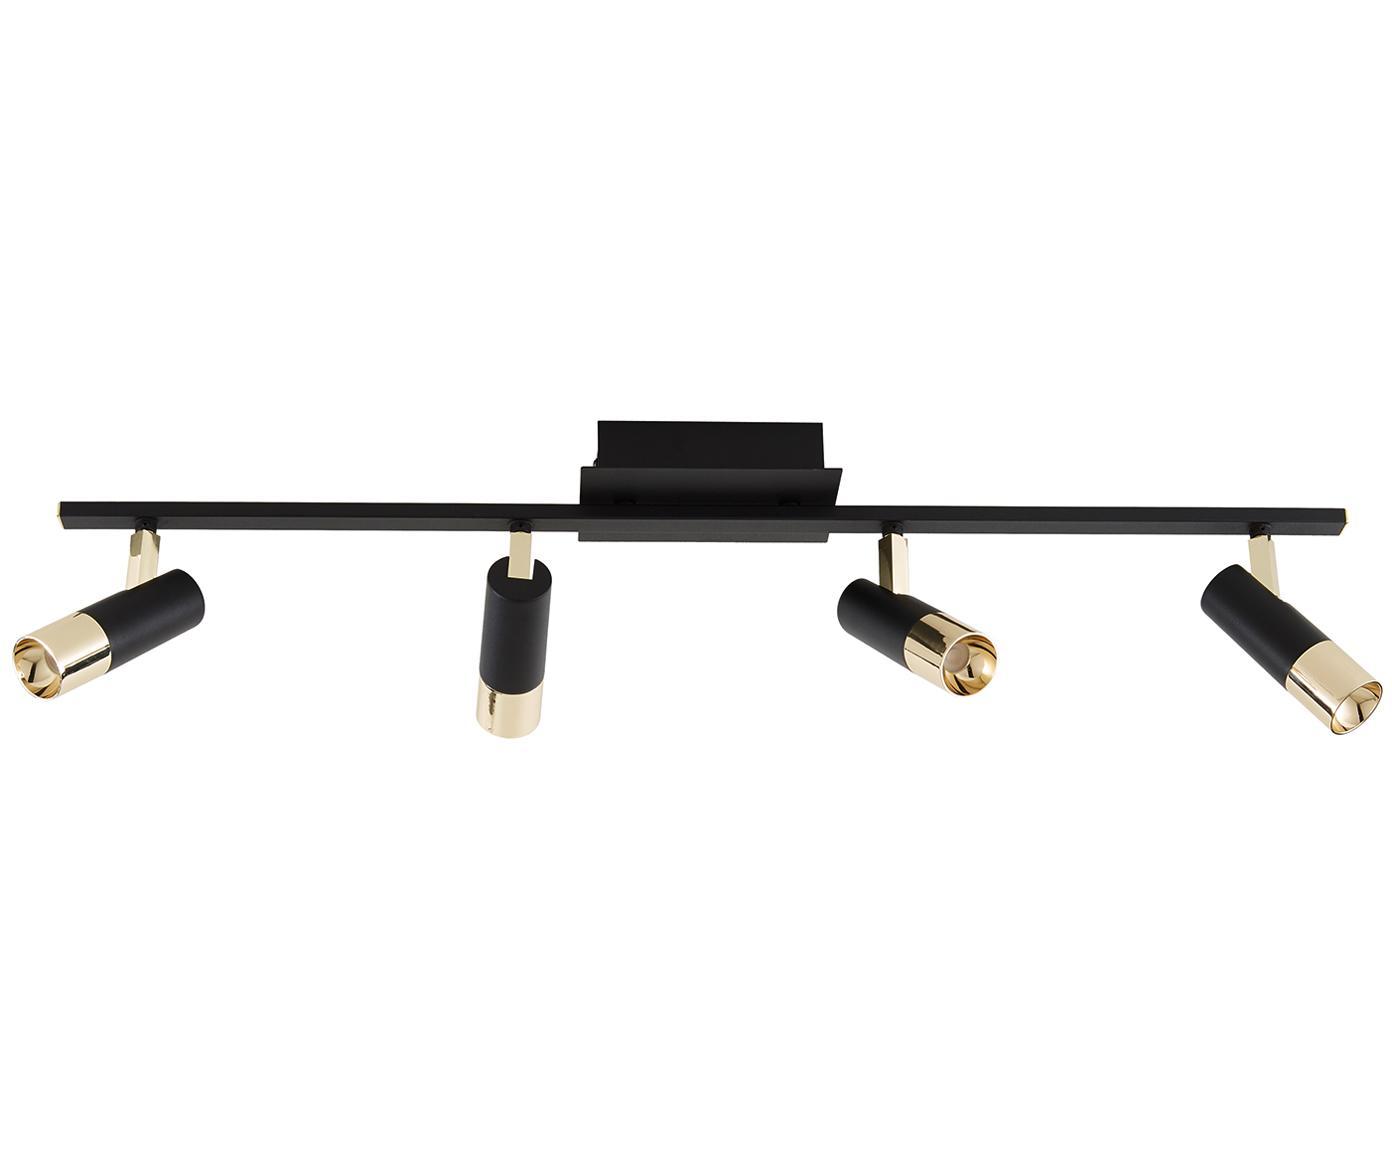 LED Deckenstrahler Bobby, Schwarz,Goldfarben, 78 x 18 cm